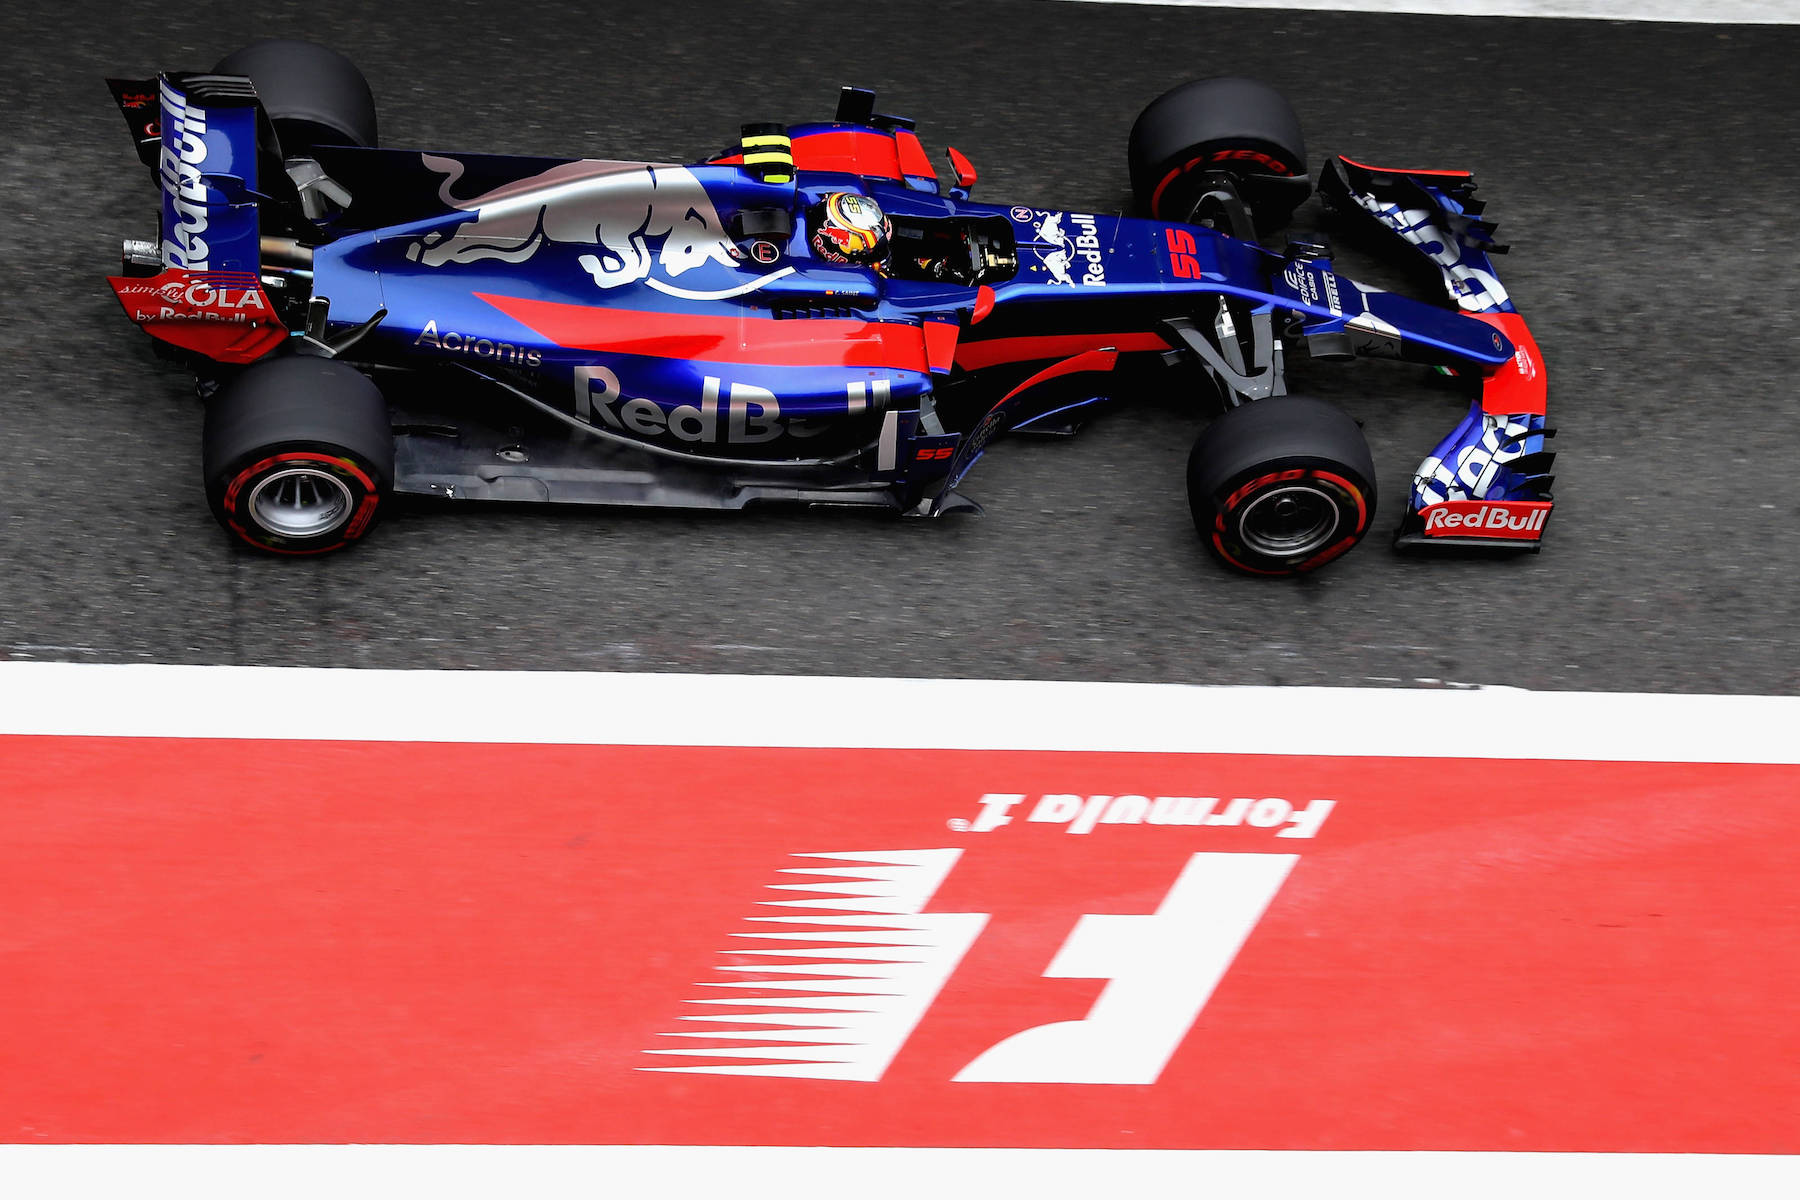 F 2017 Carlos Sainz | Toro Rosso STR12 | 2017 Chinese GP P7 3 copy.jpg